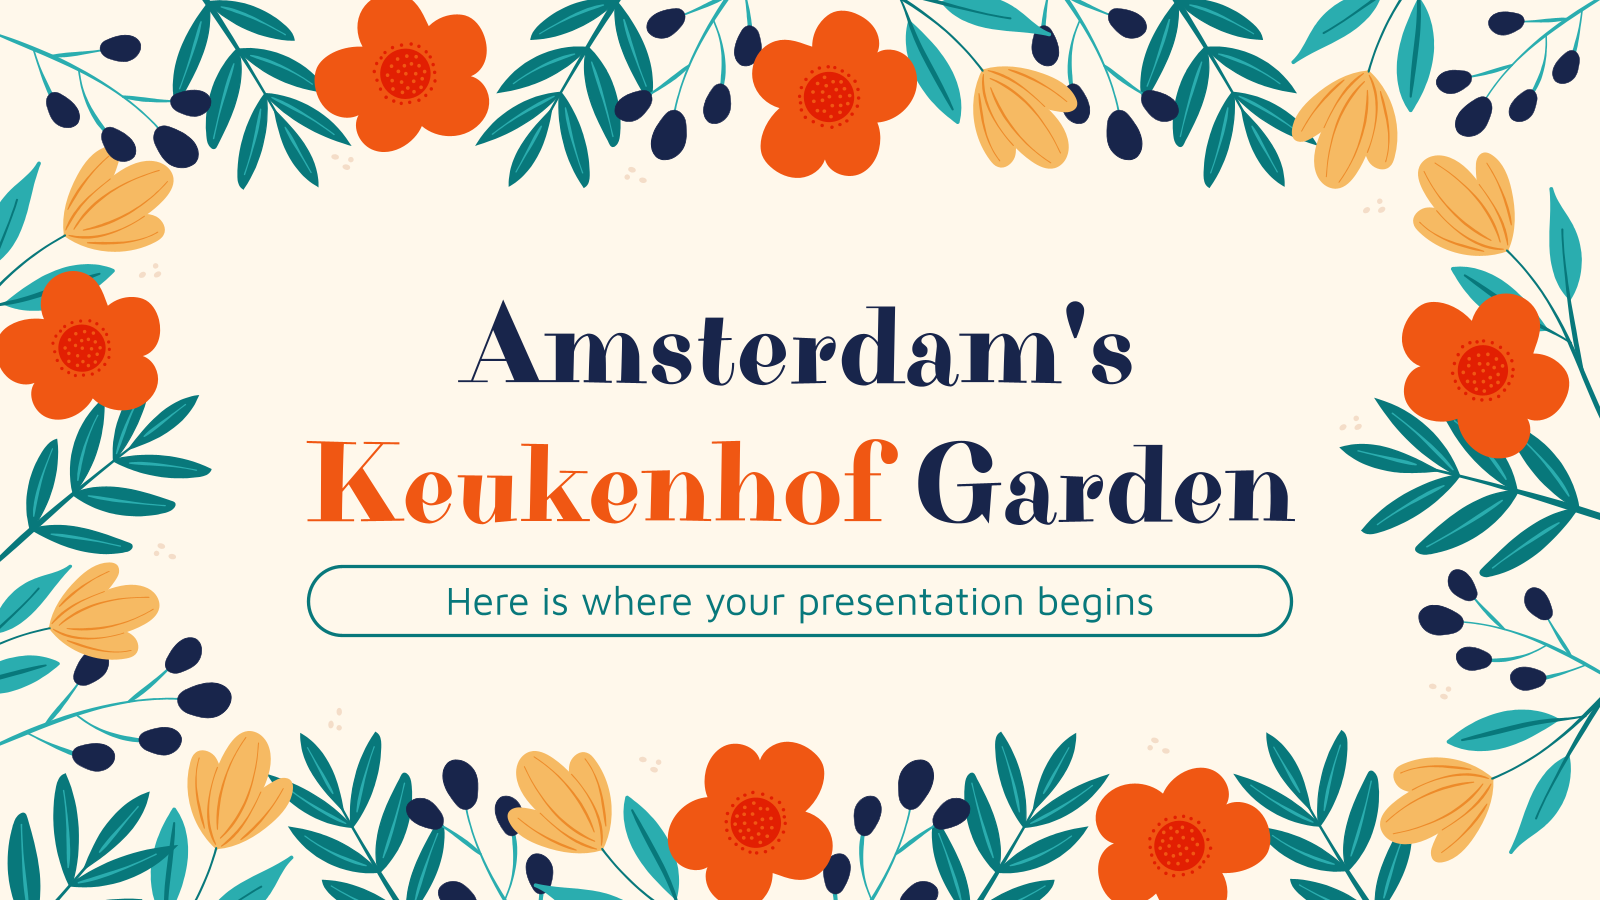 Plantilla de presentación Jardín Keukenhof de Ámsterdam